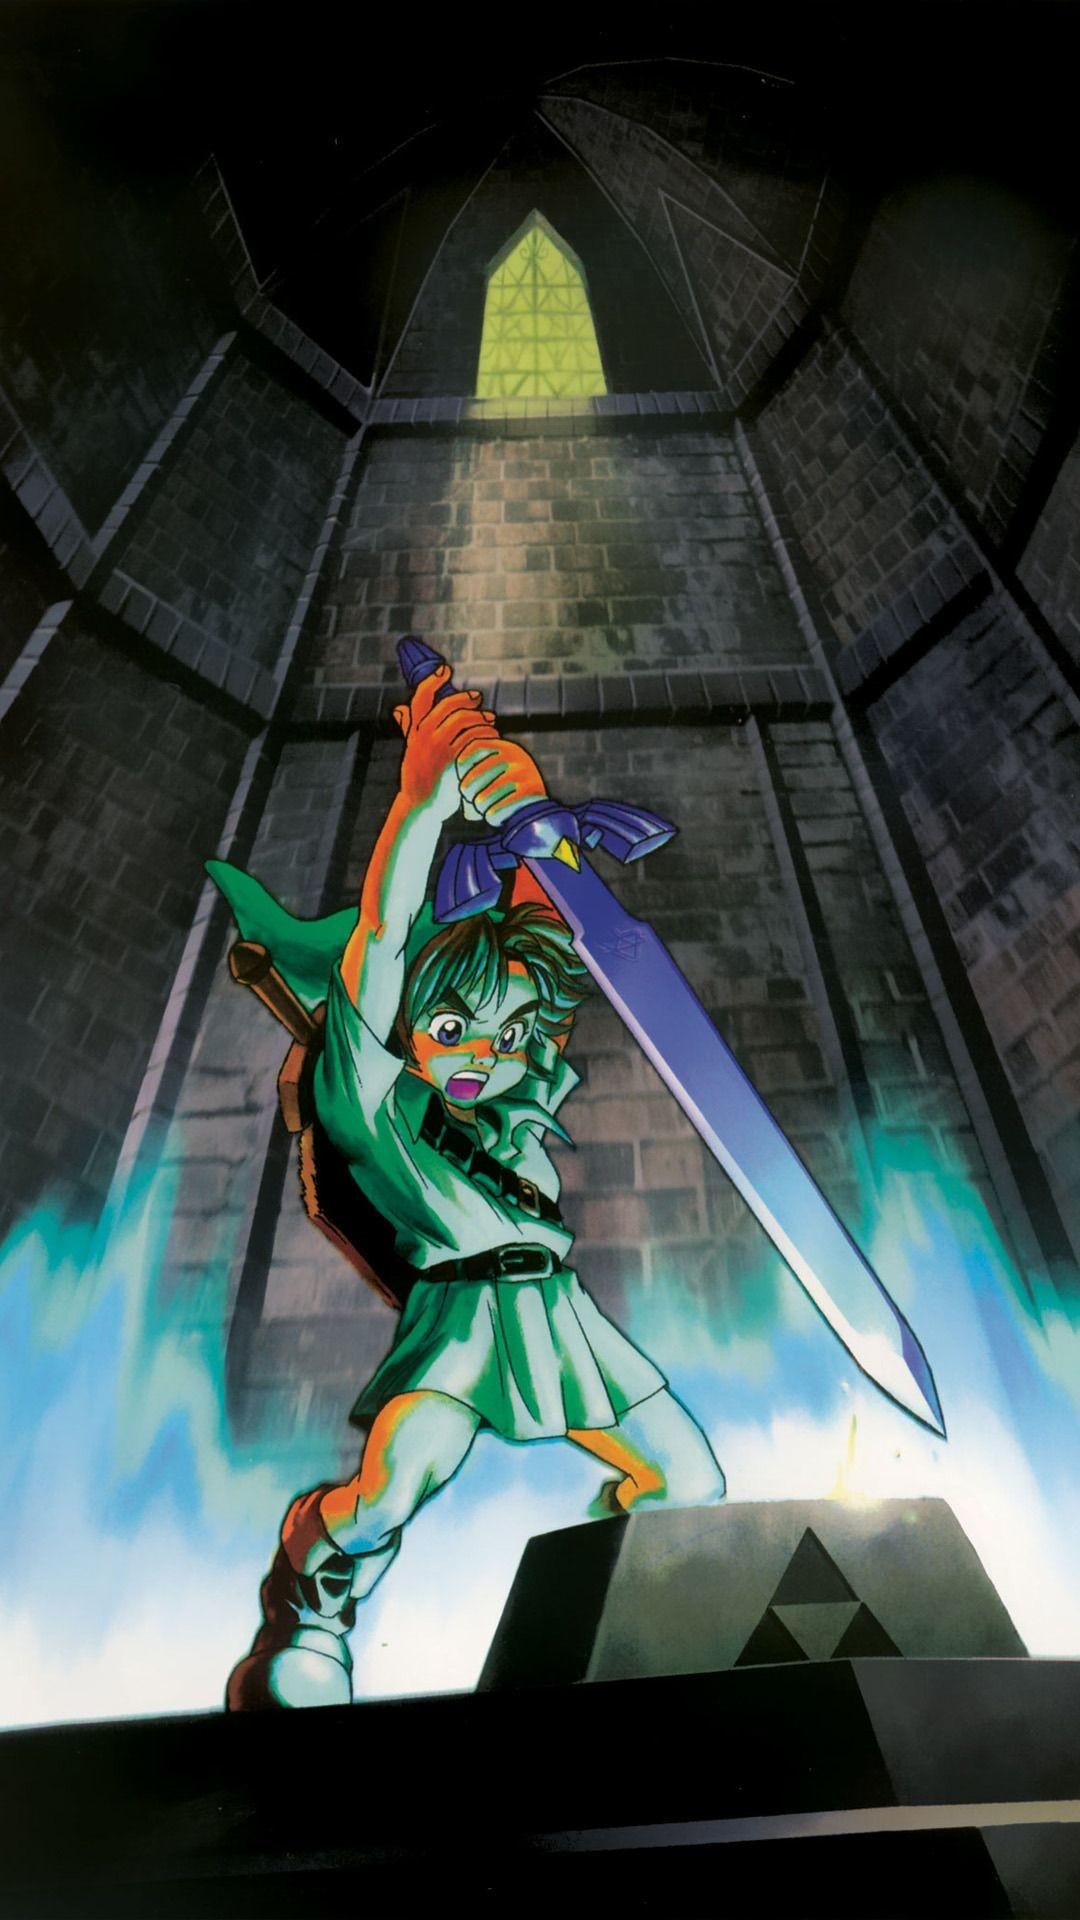 Master Sword Wallpaper 72 Images